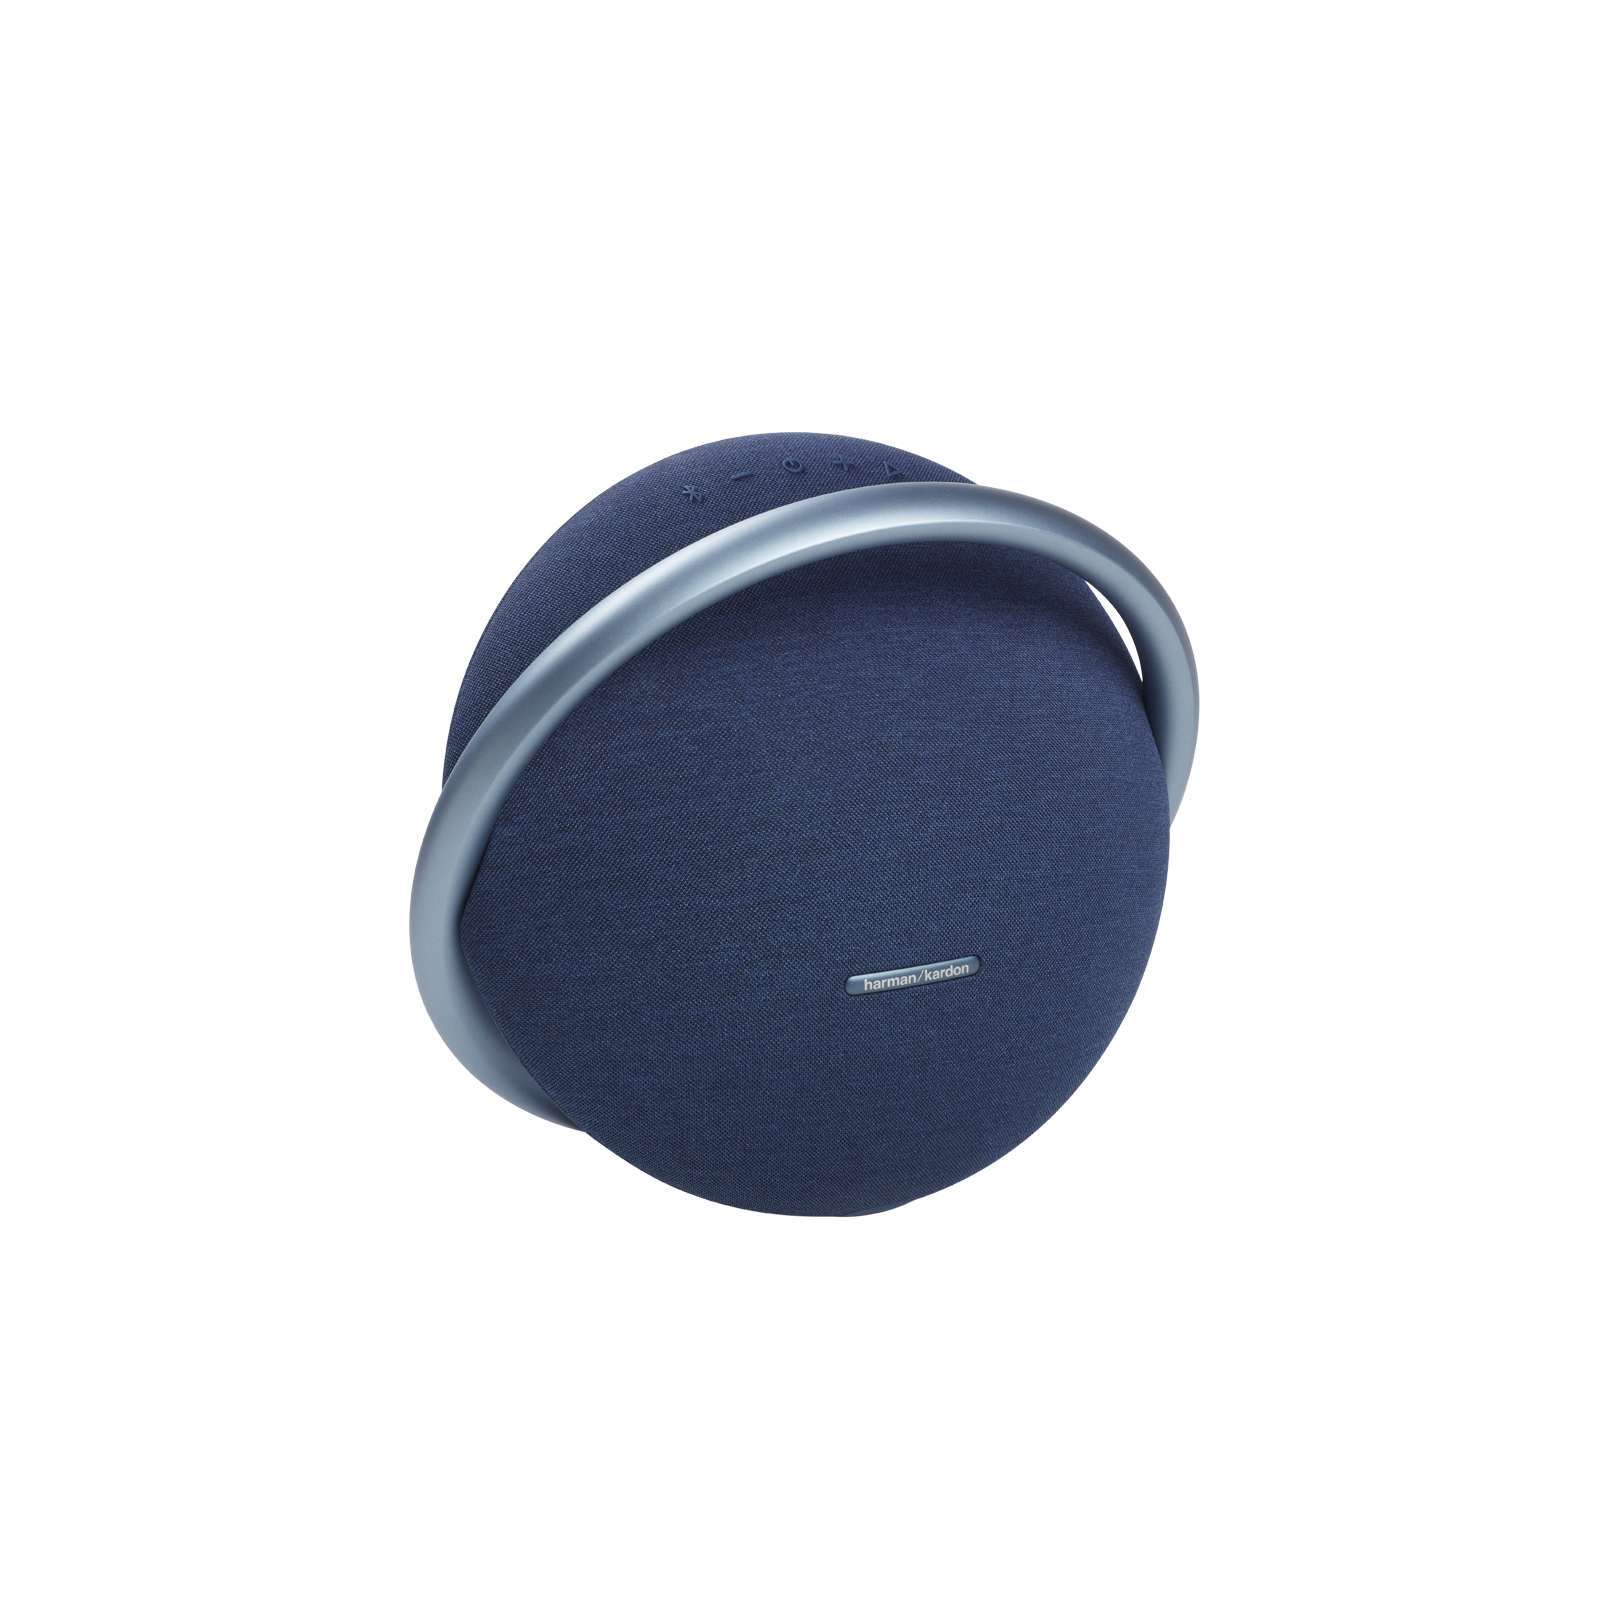 Onyx Studio 7 - Blue - Portable Stereo Bluetooth Speaker - Hero